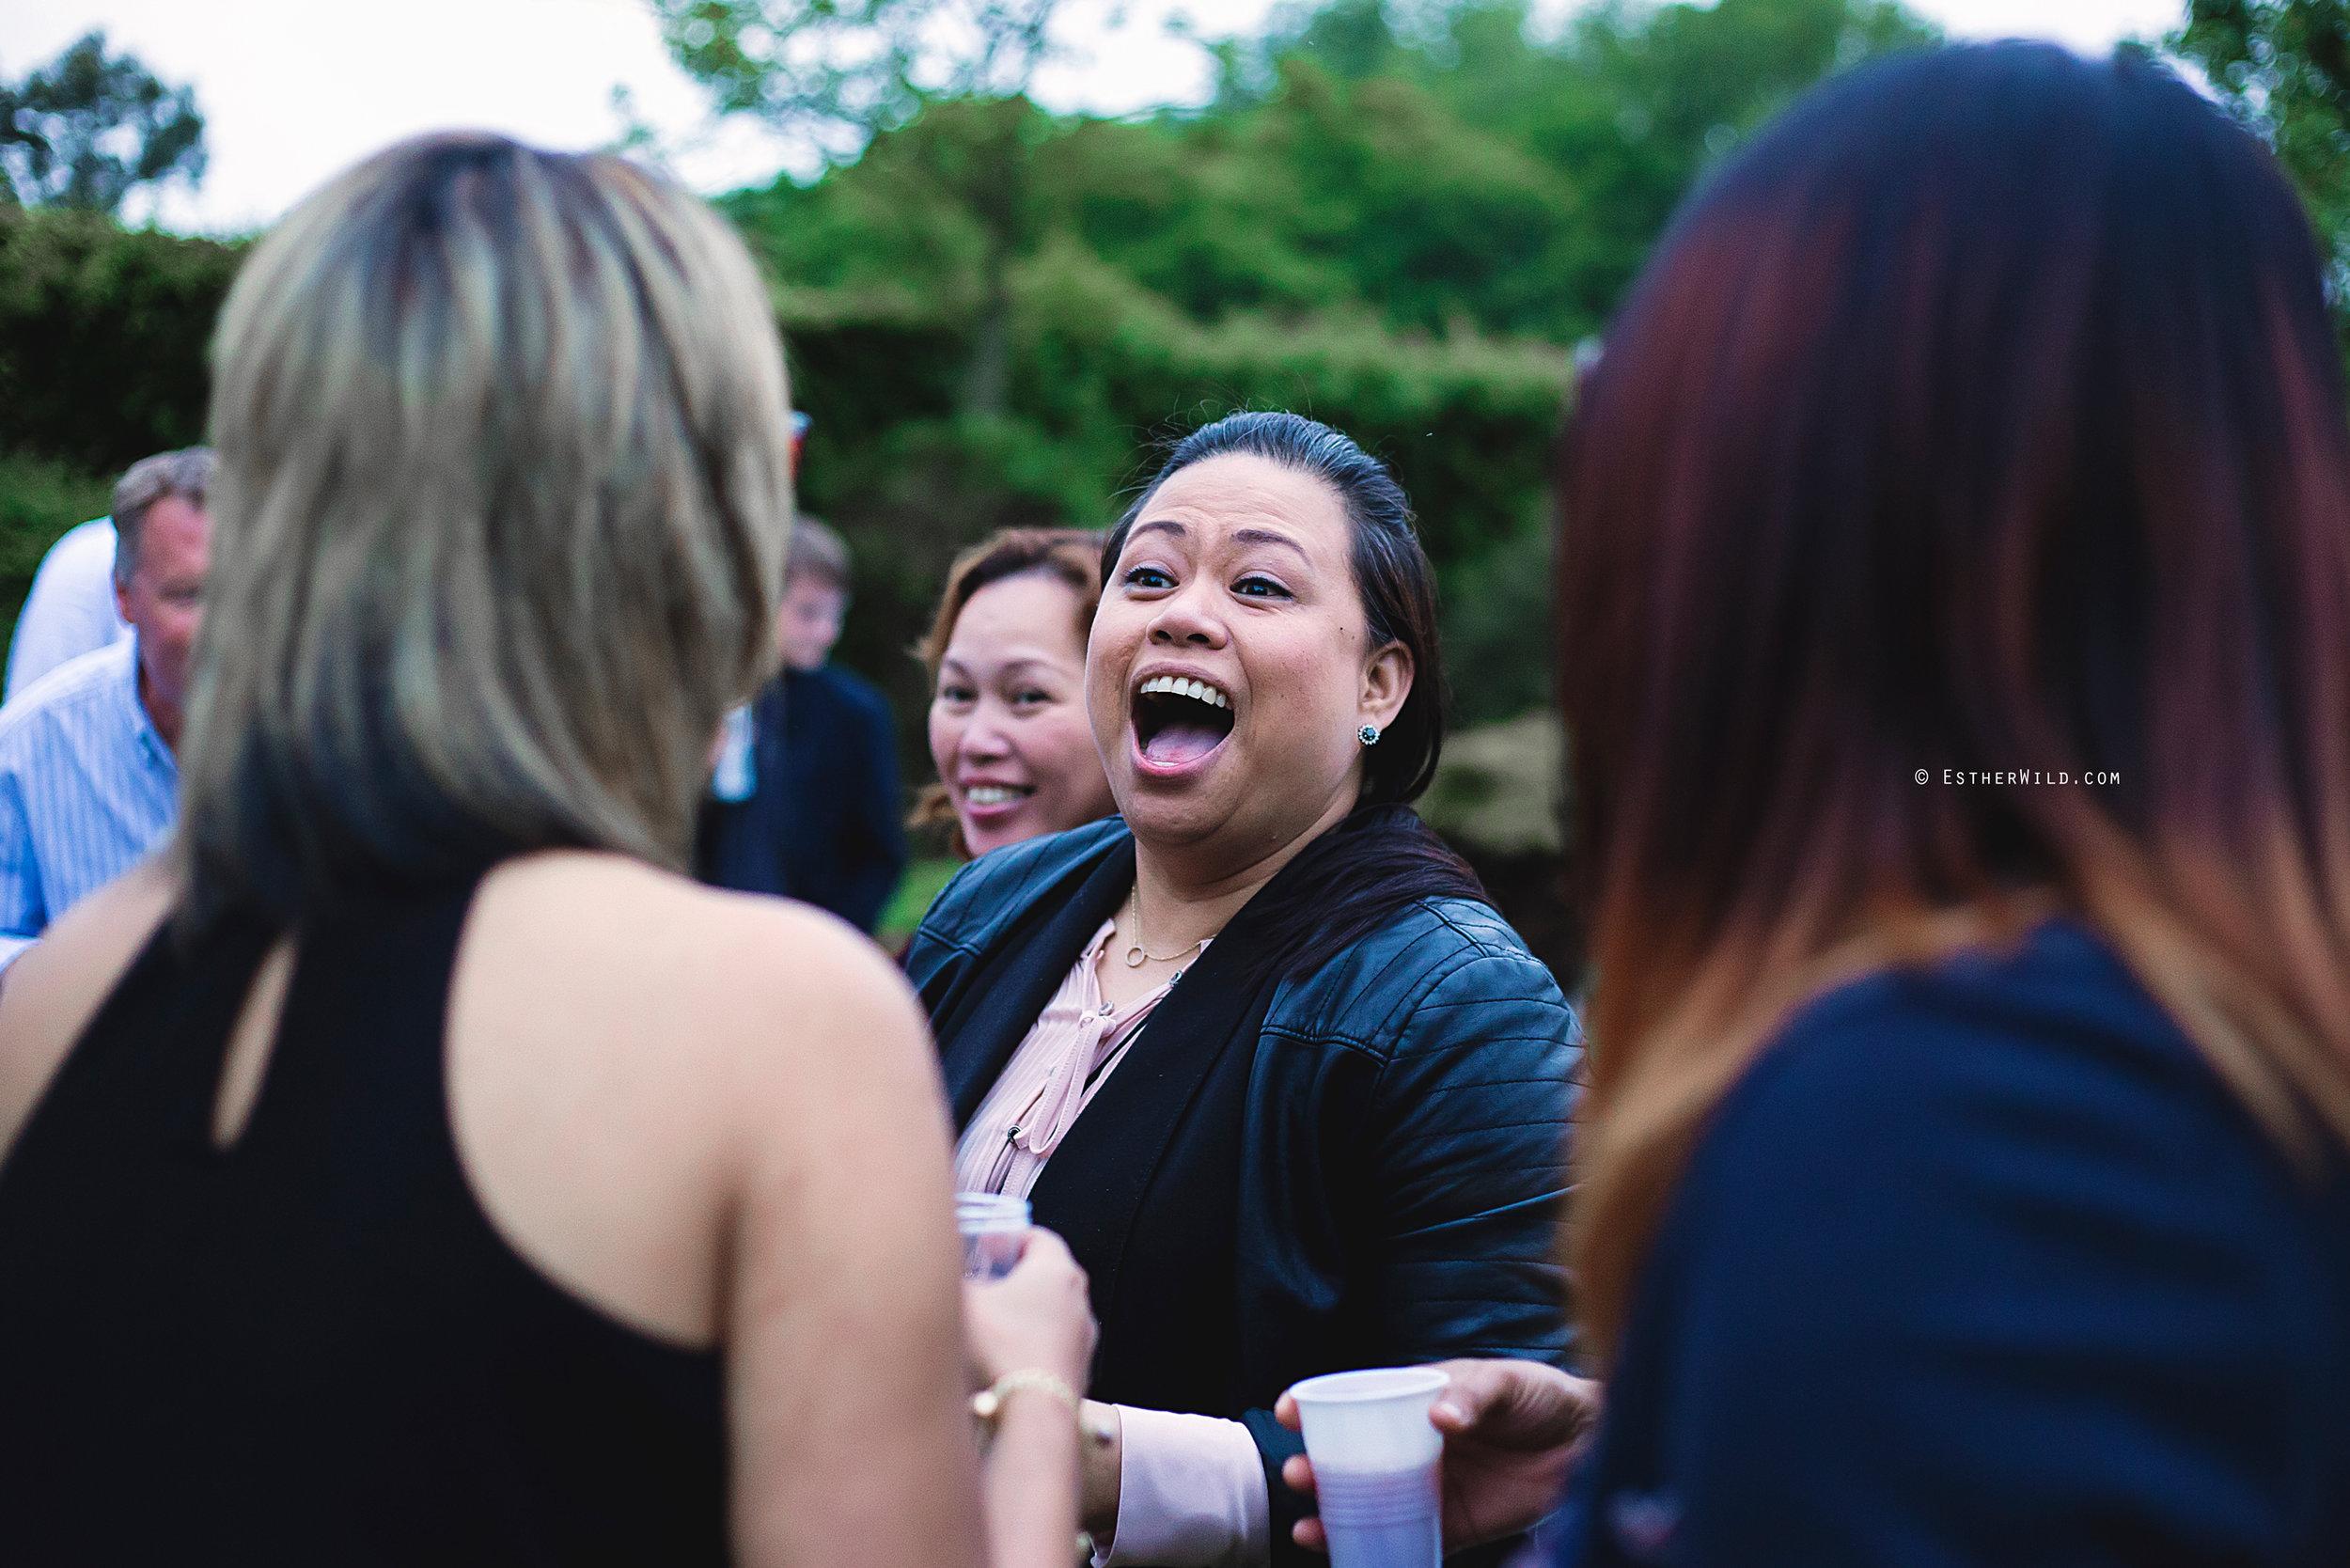 Wedding_Photographer_Photography_Norfolk_UK_Kings_Lynn (6).jpg